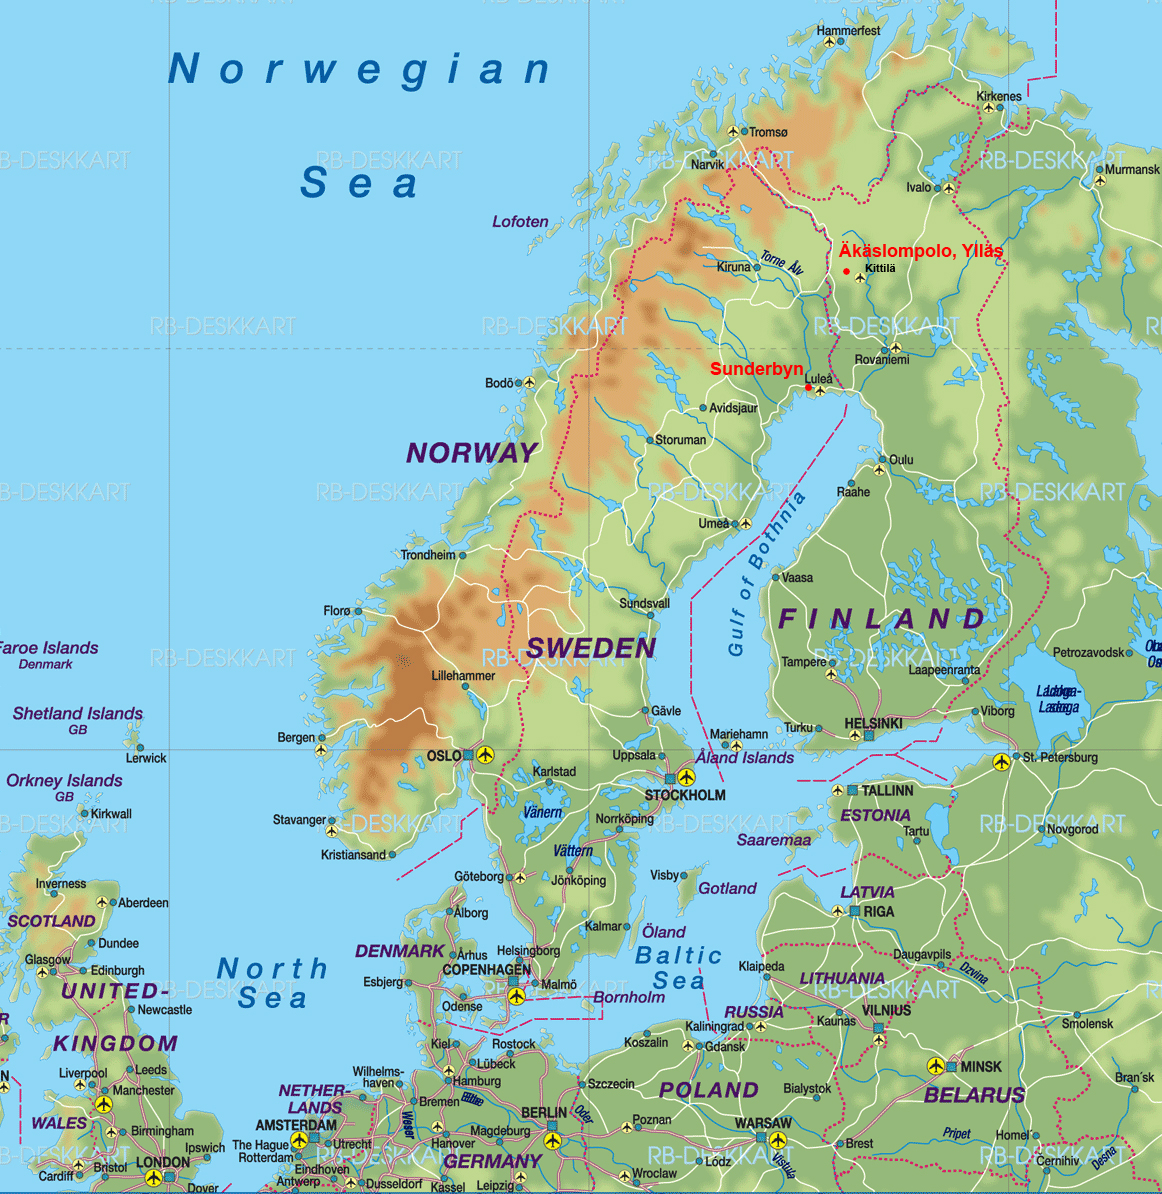 Lapland Sweden Or Finland Sunderbyn Luleå Or Äkäslompolo Ylläs - Sweden lapland map